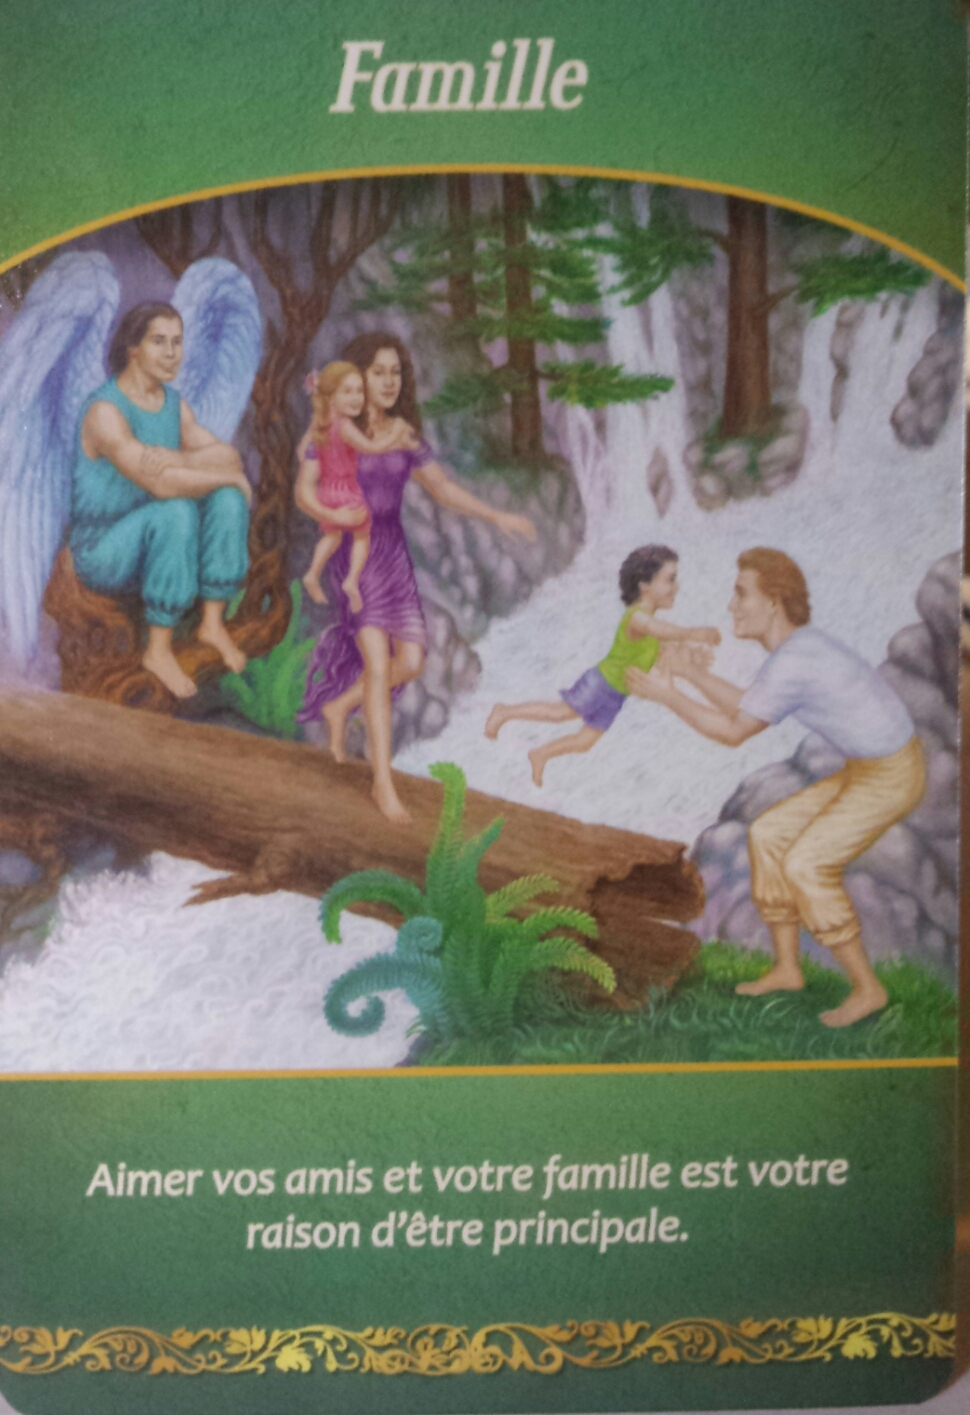 jeu le sens de la vie , la famille , doreen virtue, le monde de kokolou .com